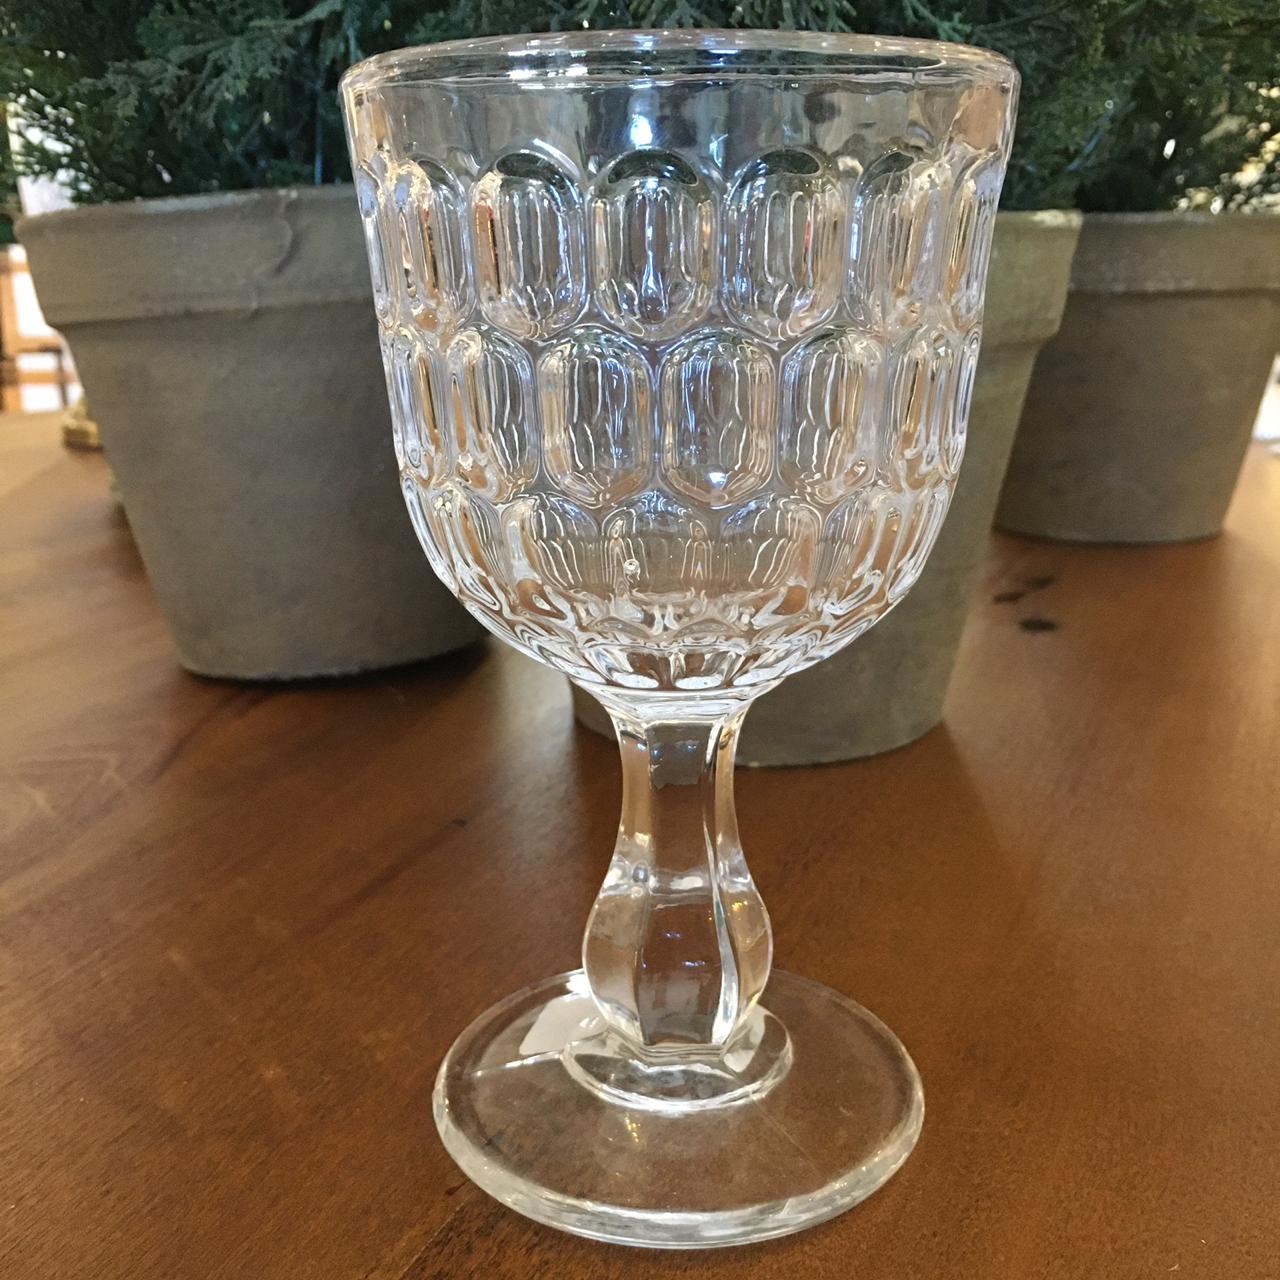 Kit 4 Taças para Água de Vidro Transparente BTC 300ml  - Lemis